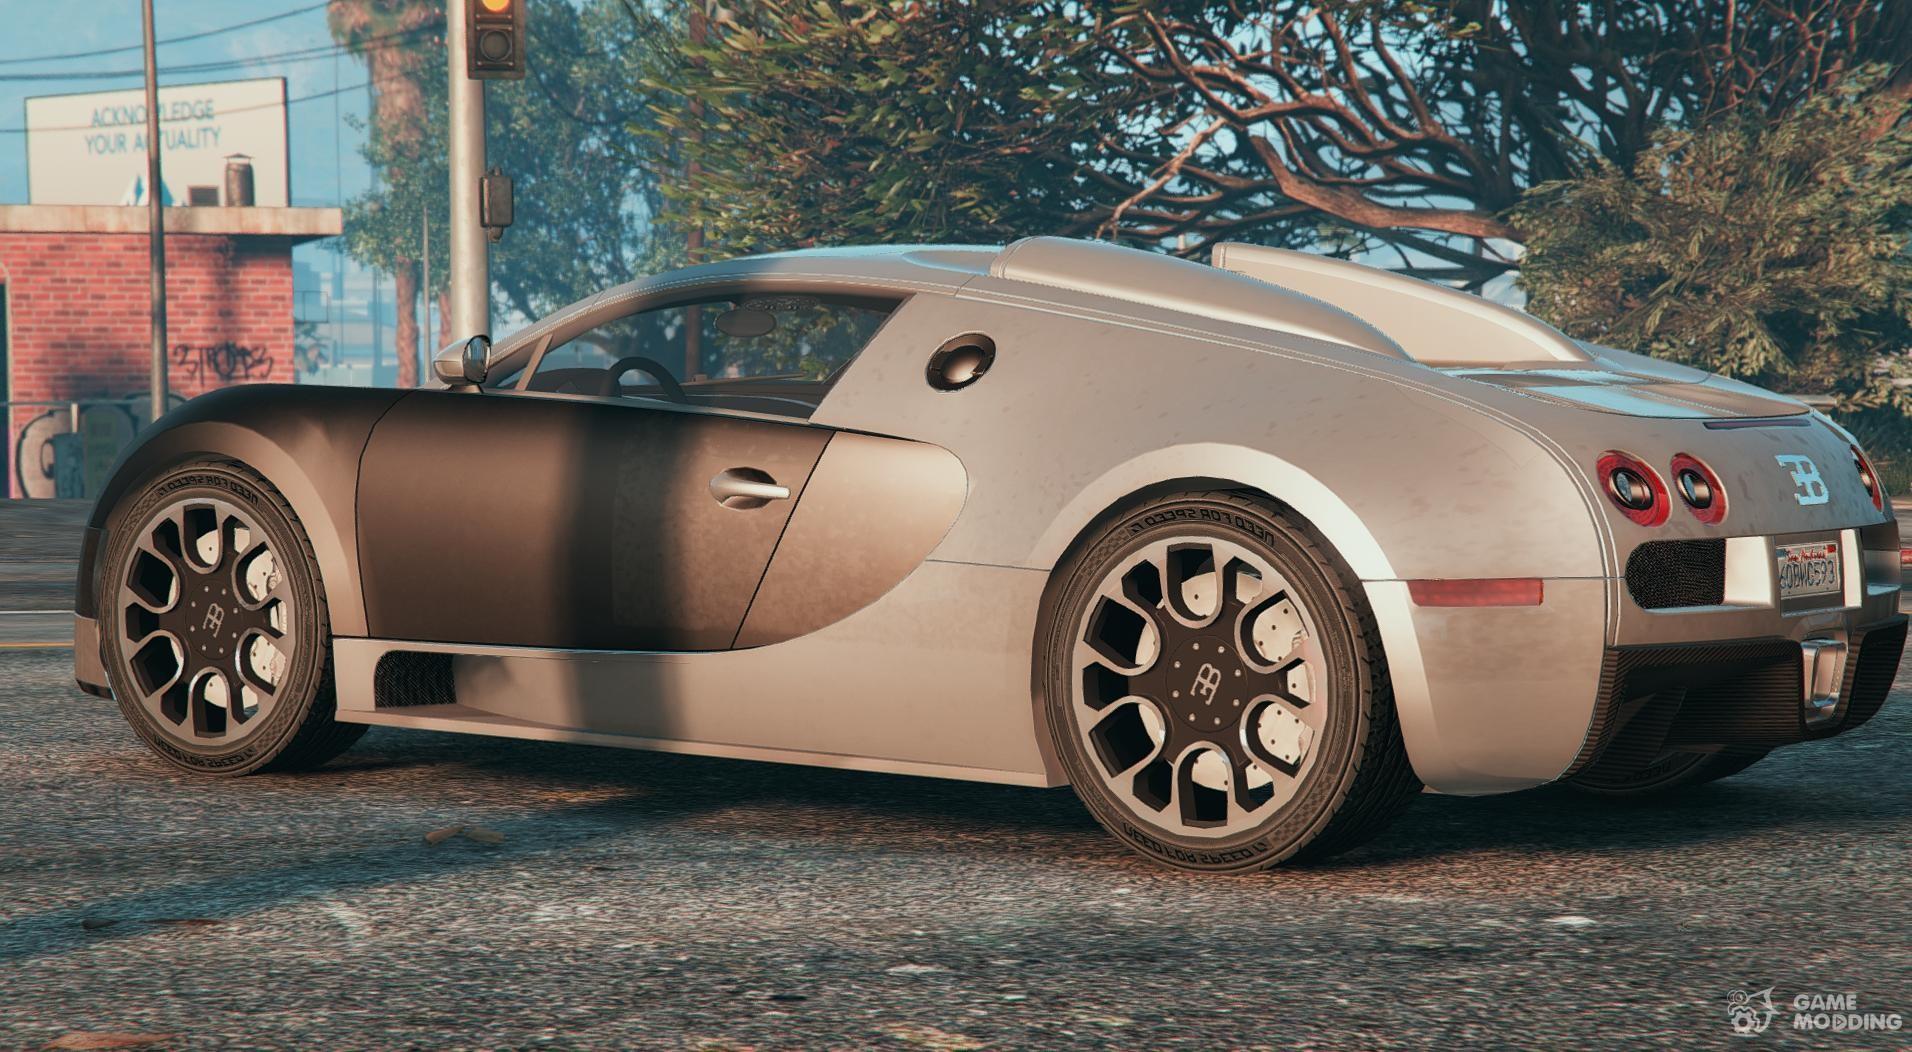 564208894a7d34b9c44af5f4eeef8fdd0752c5f13ebbf5d12237cb2c4349ce61 Wonderful Bugatti Veyron Xbox 360 Games Cars Trend